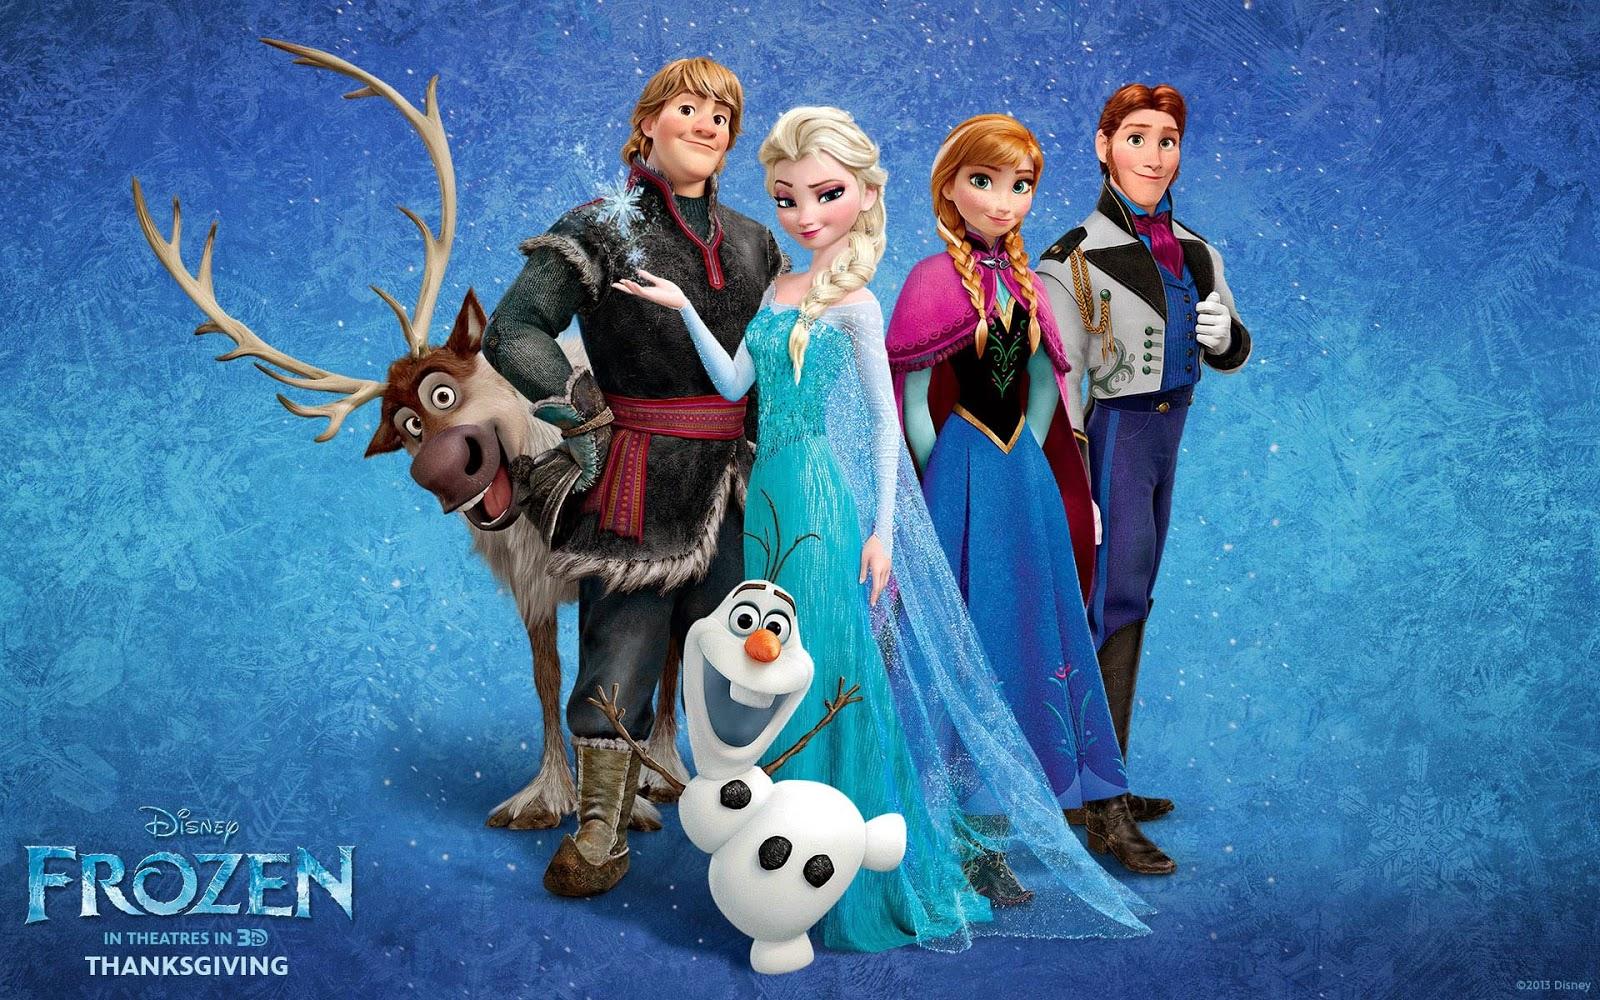 Nurvtech: Disney's Frozen Wallpaper (Various)